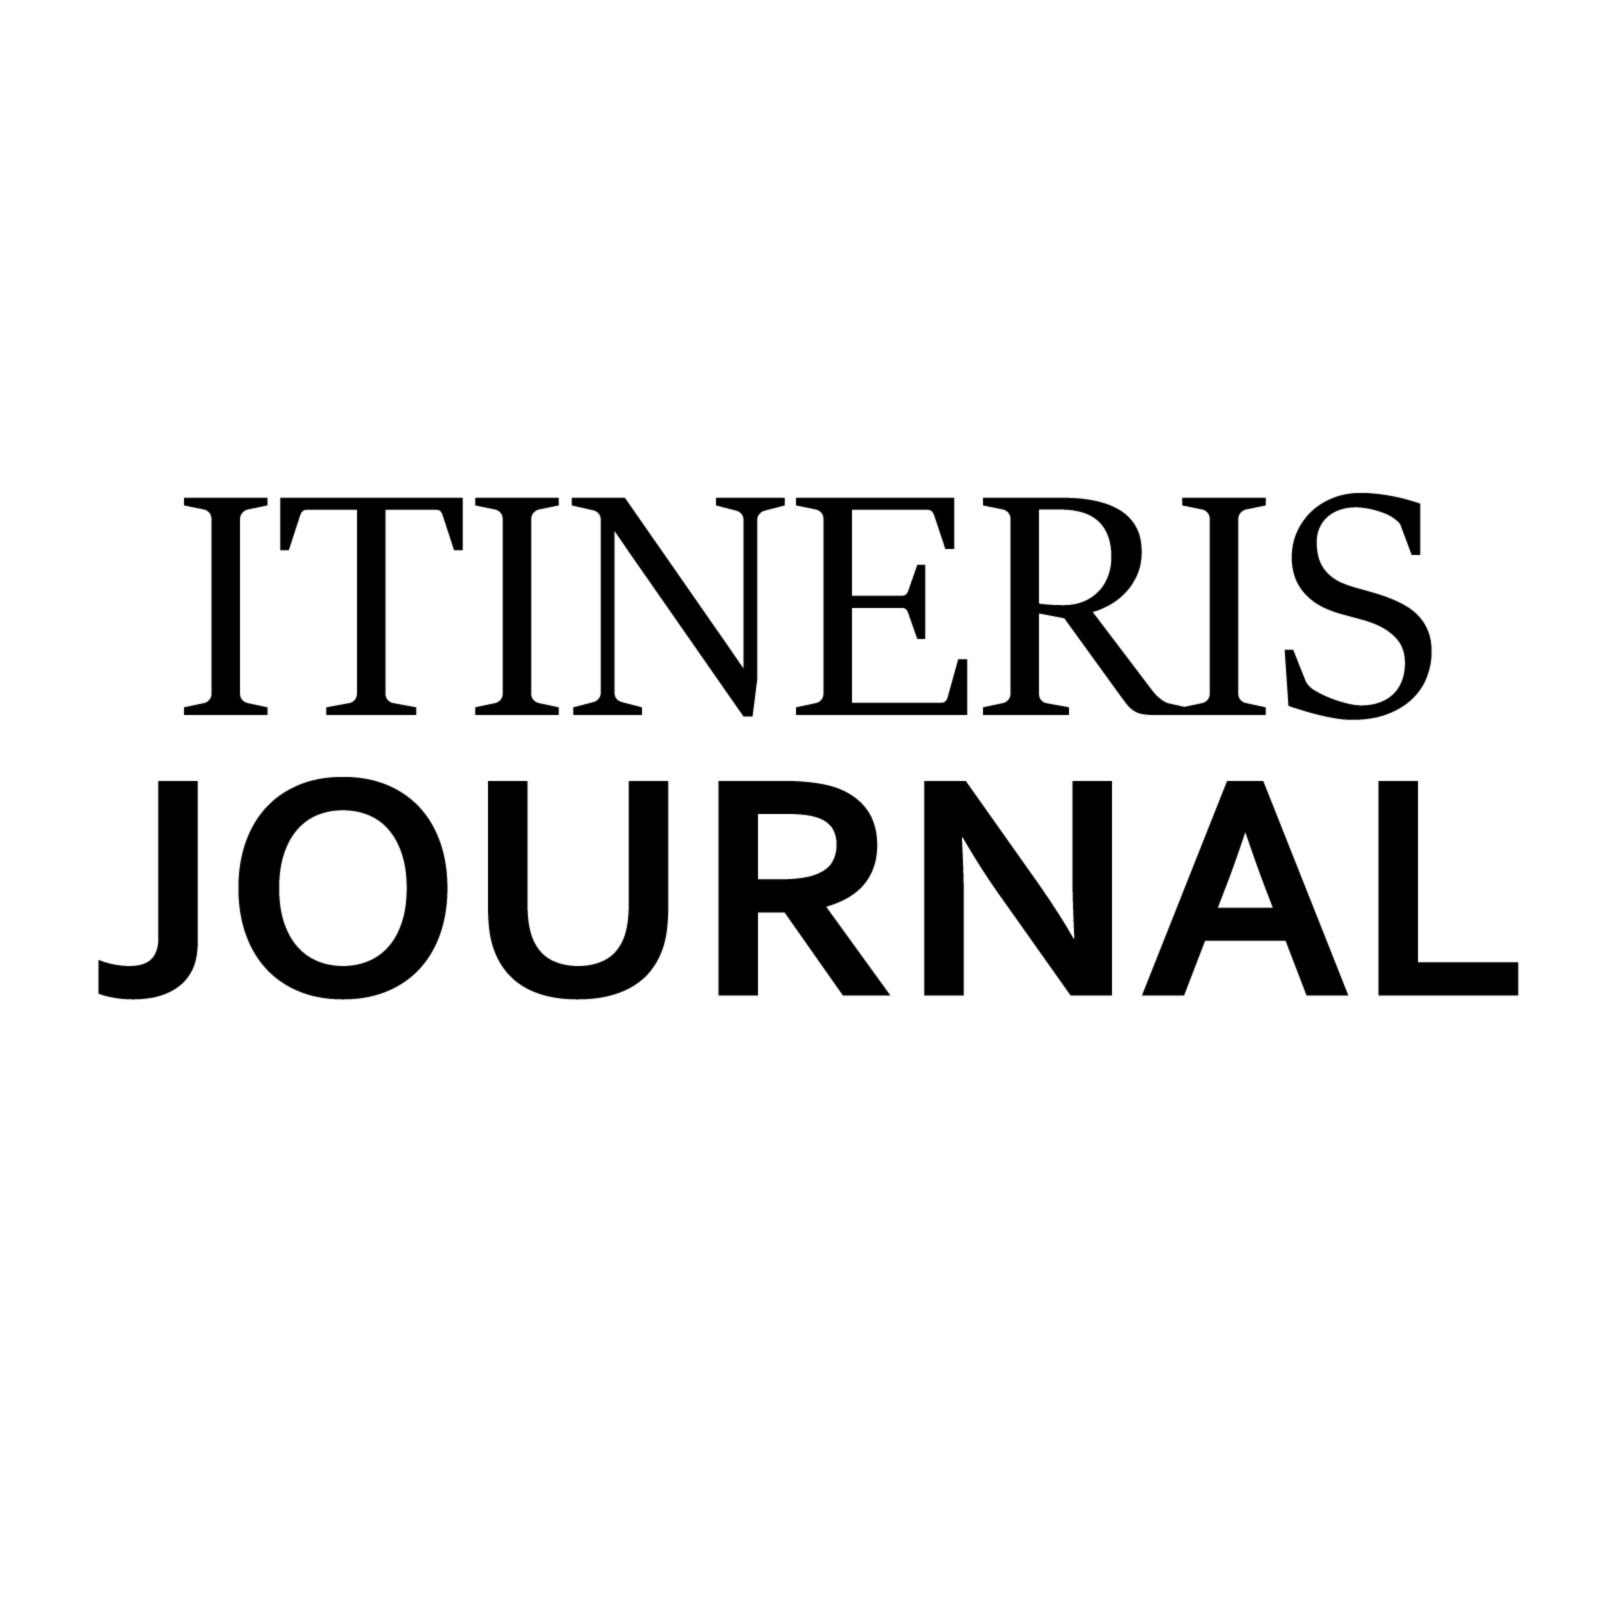 Itineris JOURNAL